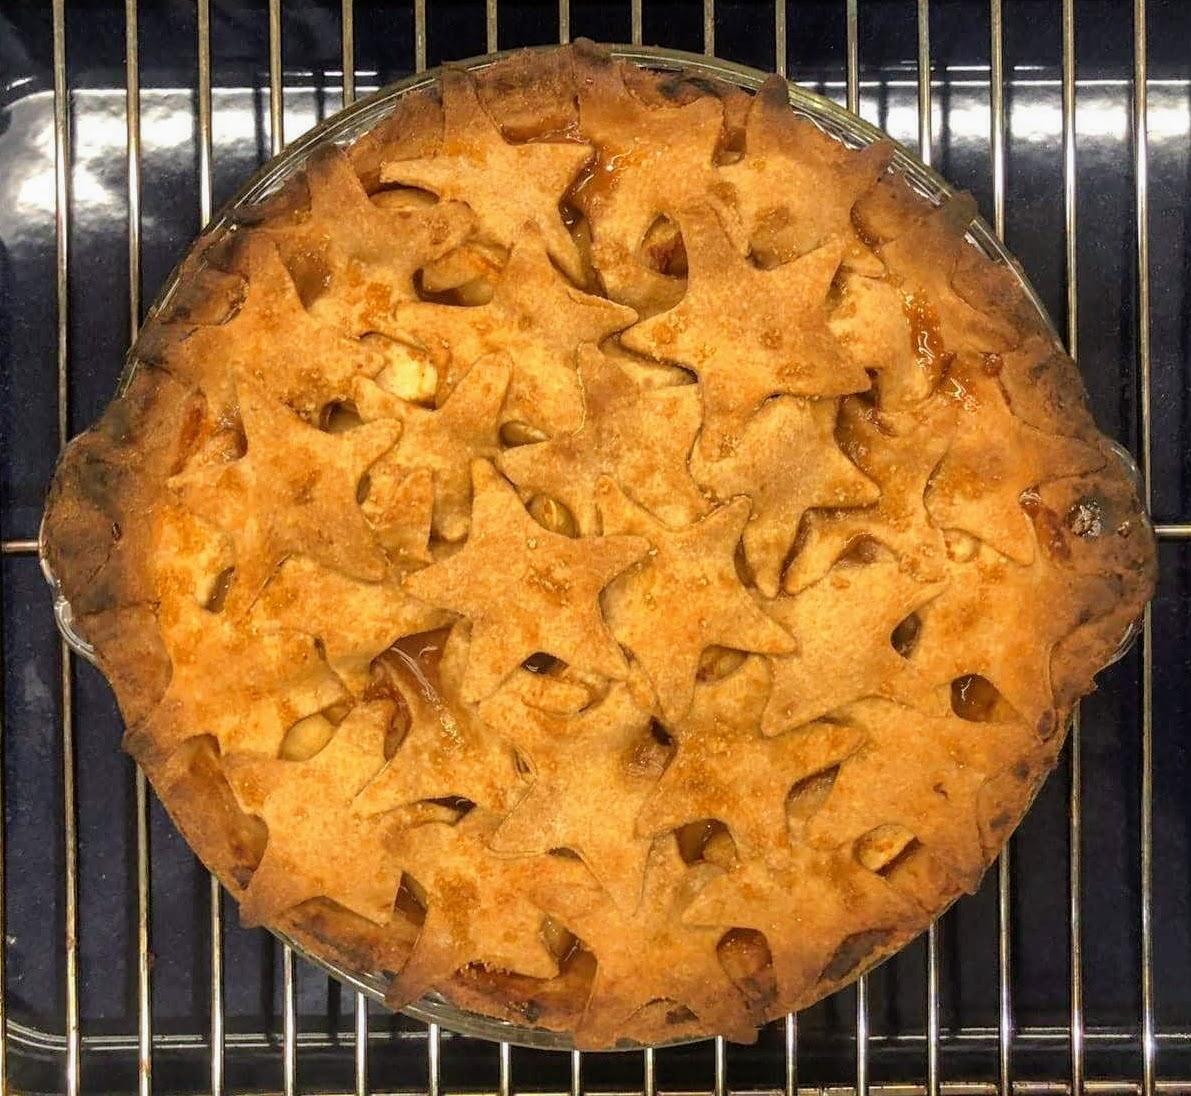 Apple Pie with Stars crust